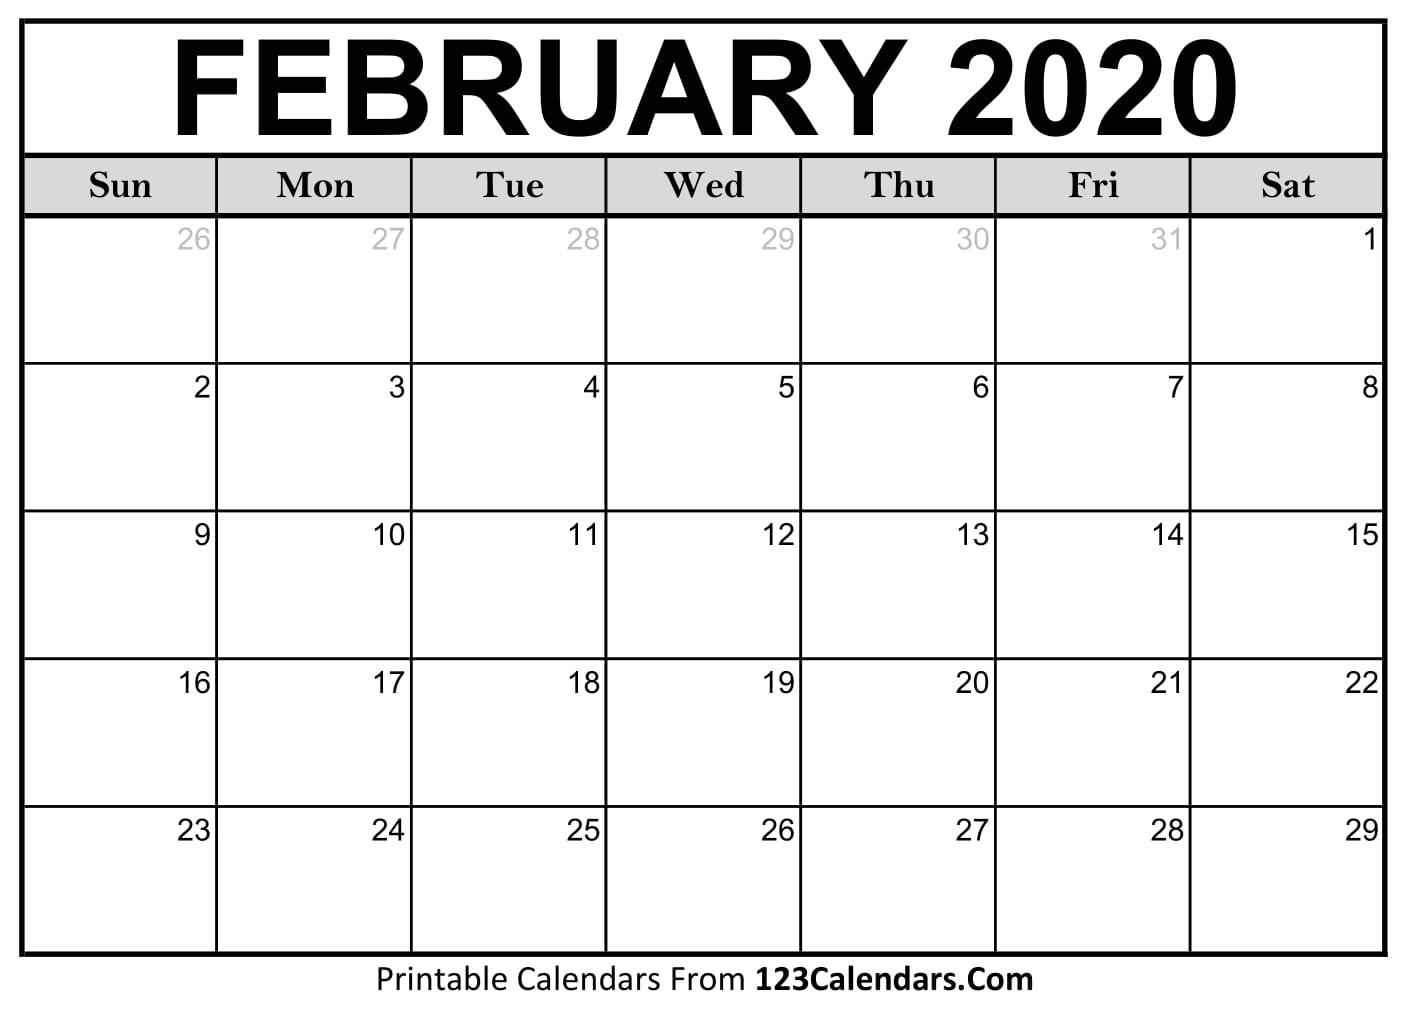 February 2020 Printable Calendar | 123Calendars  February 2020 Calendar Printable